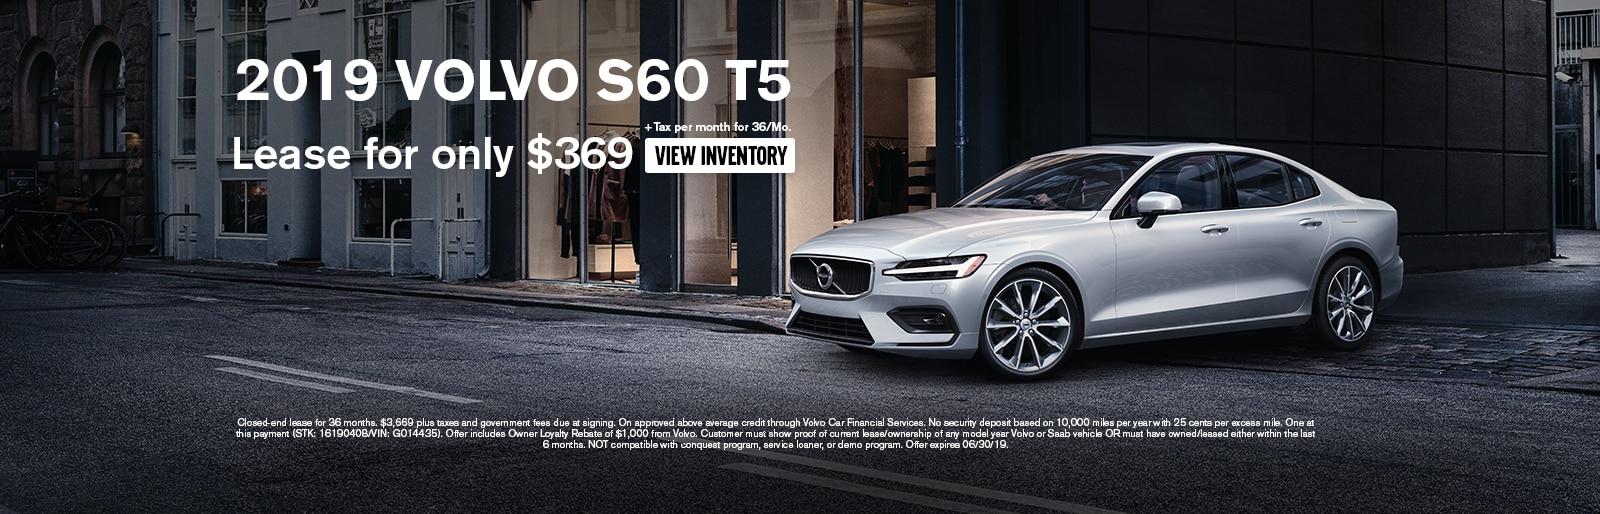 Volvo Dealership Los Angeles >> Rusnak Pasadena Volvo Serves Los Angeles Pasadena West